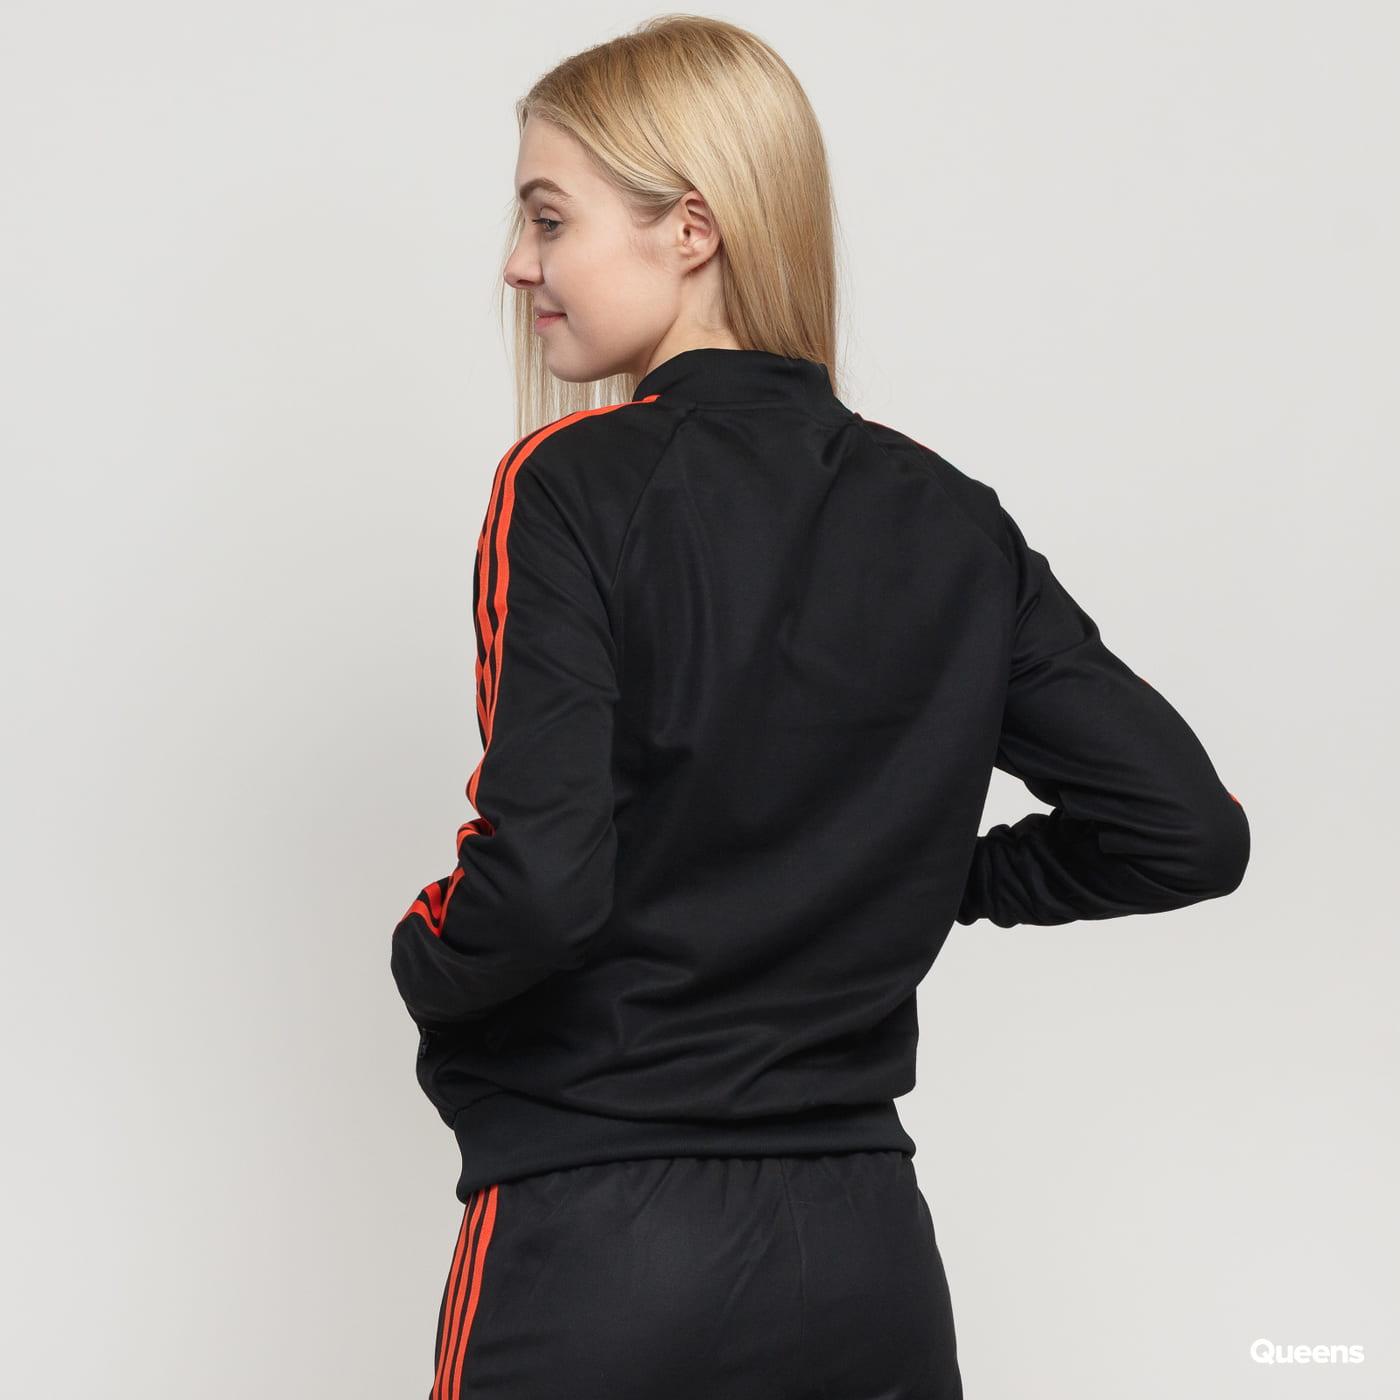 e155a0c5b Dámska mikina adidas Originals SST Track Top čierna (DU9941) – Queens 💚